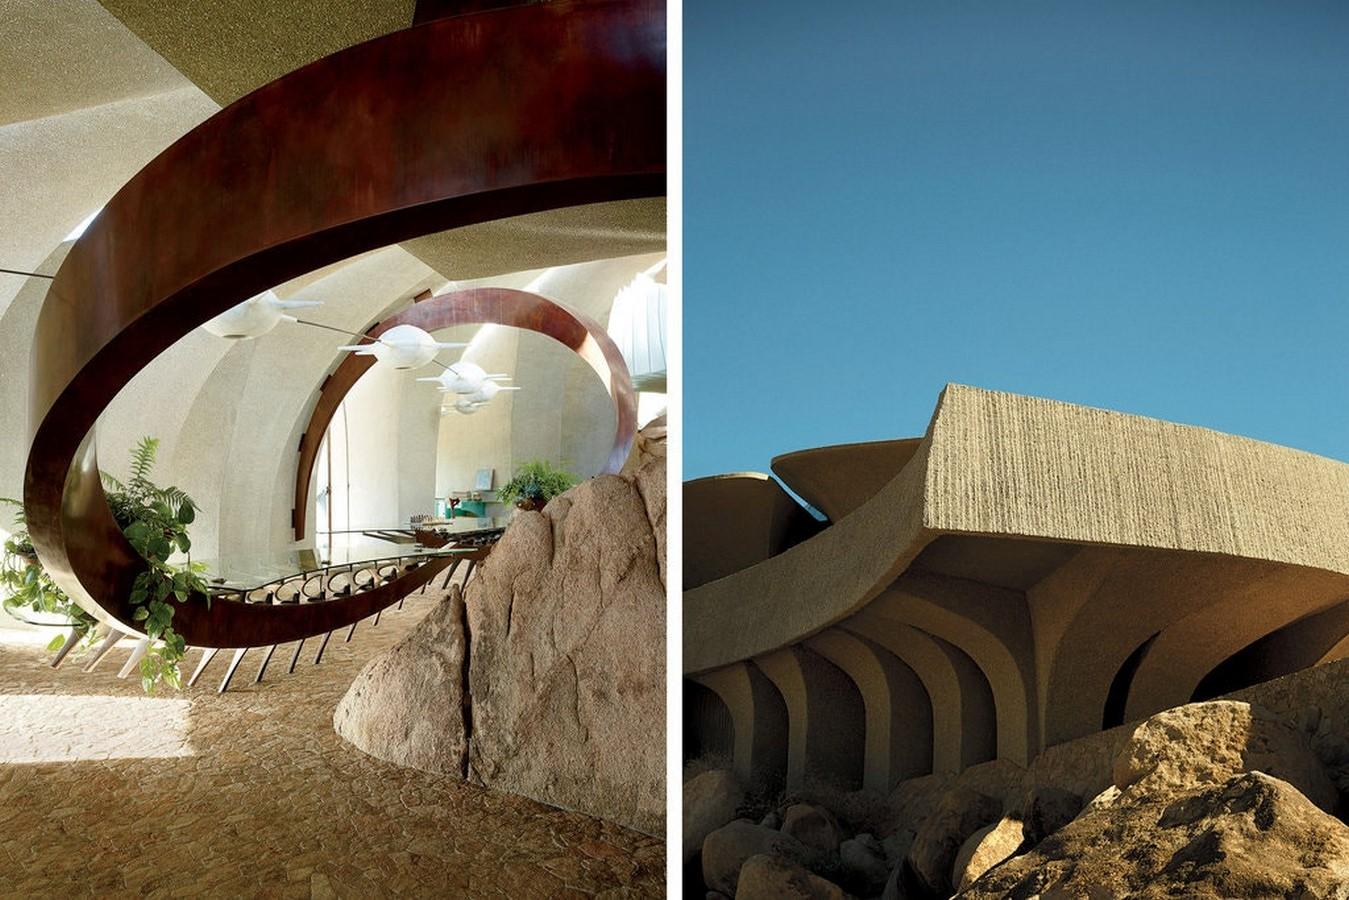 Organic Architecture - Kendrick Bangs Kellogg - Sheet1